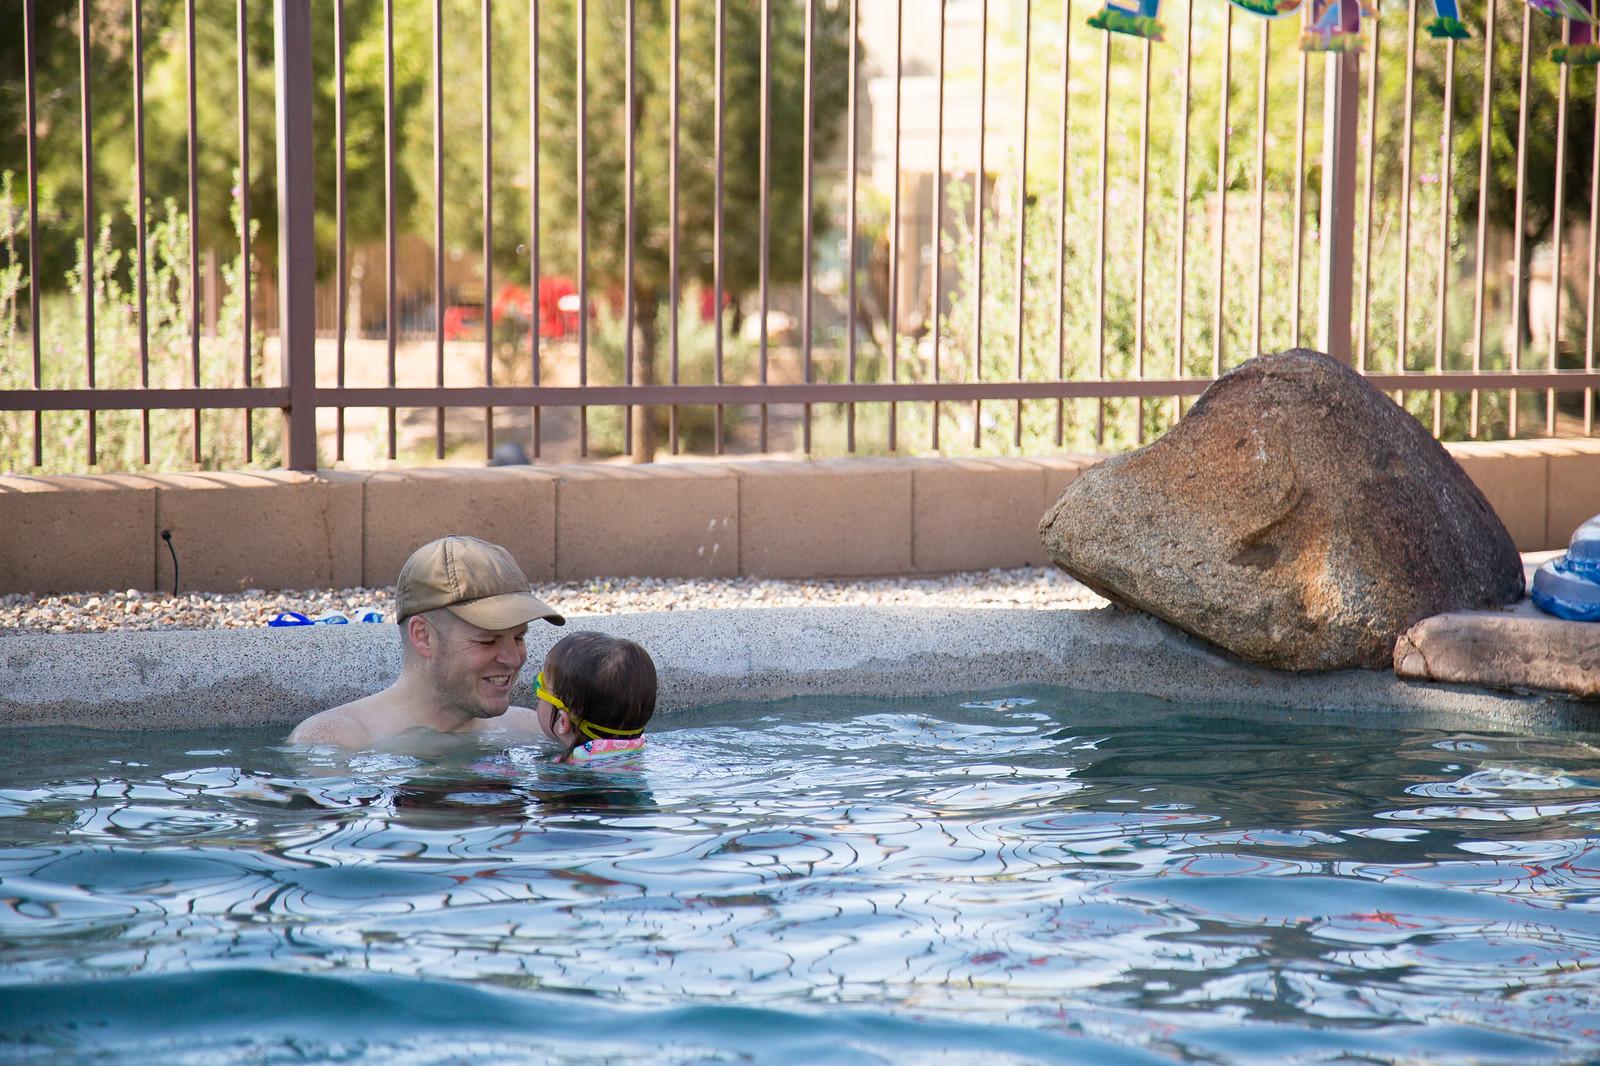 2015-03-12 Arizona-6143.jpg